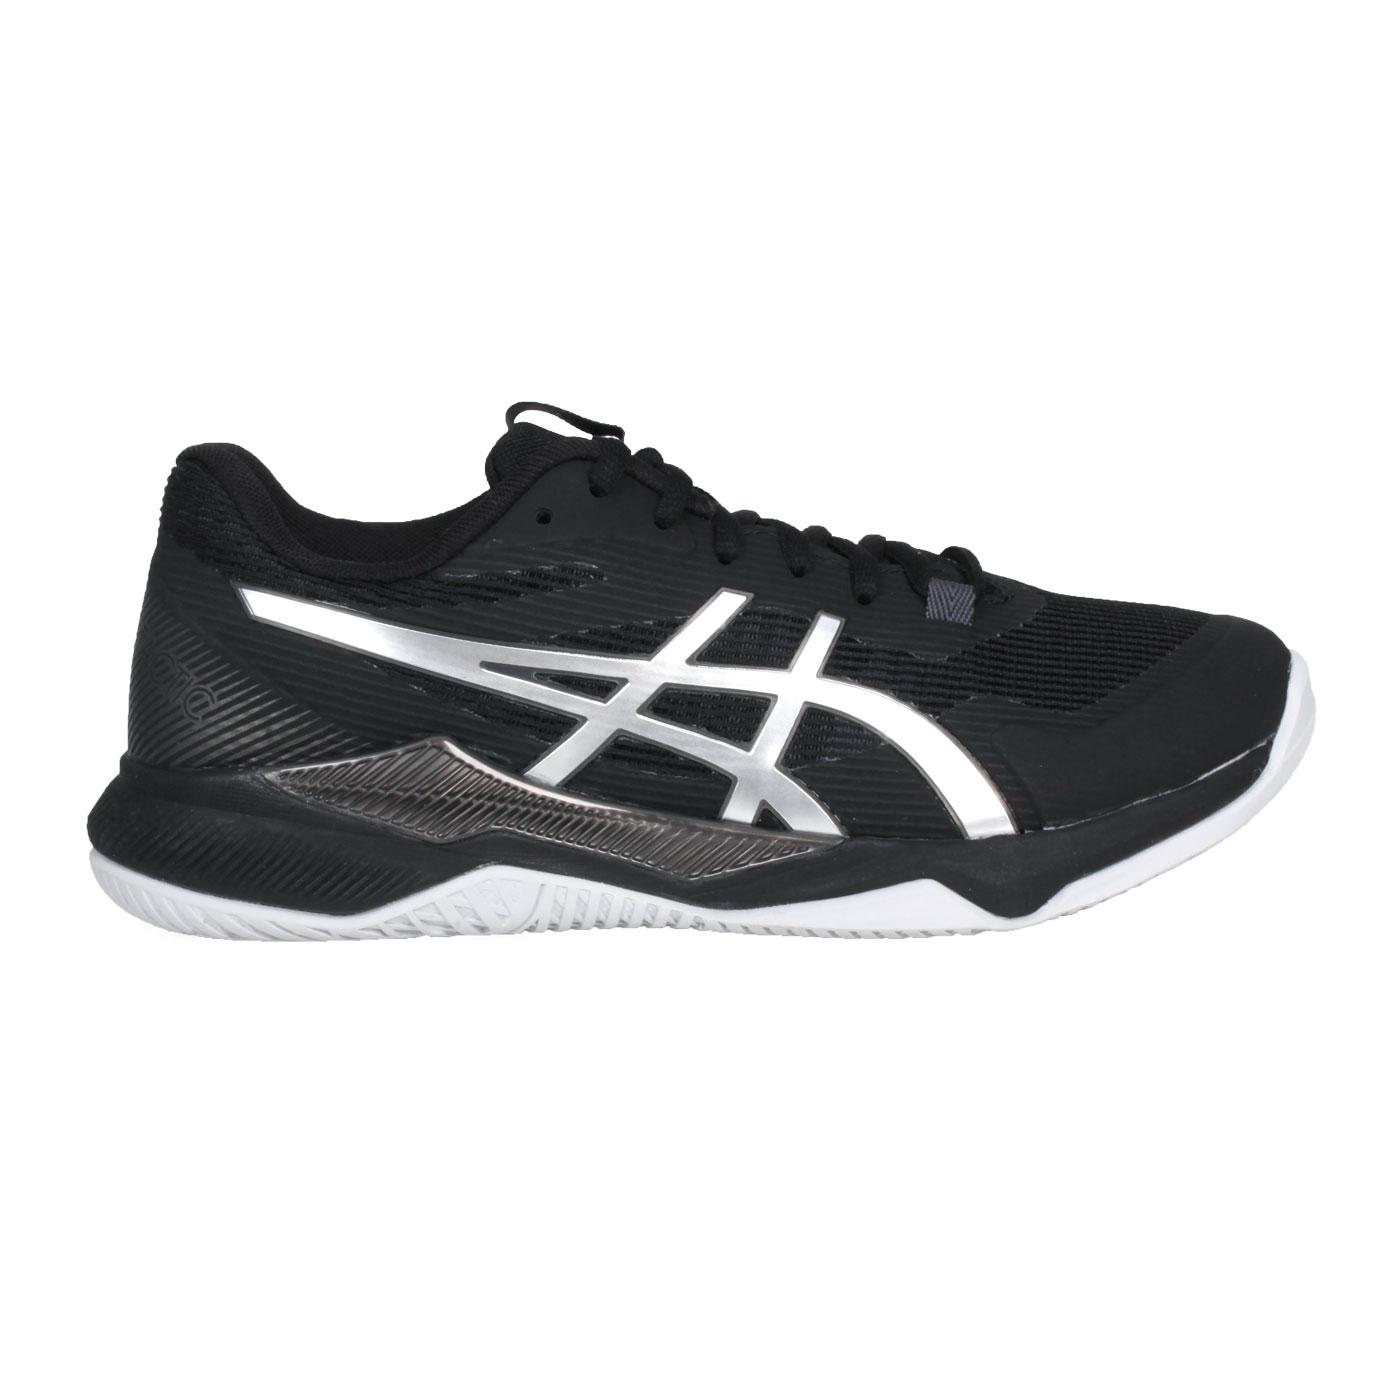 ASICS 排羽球鞋  @GEL-TACTIC@1073A051-003